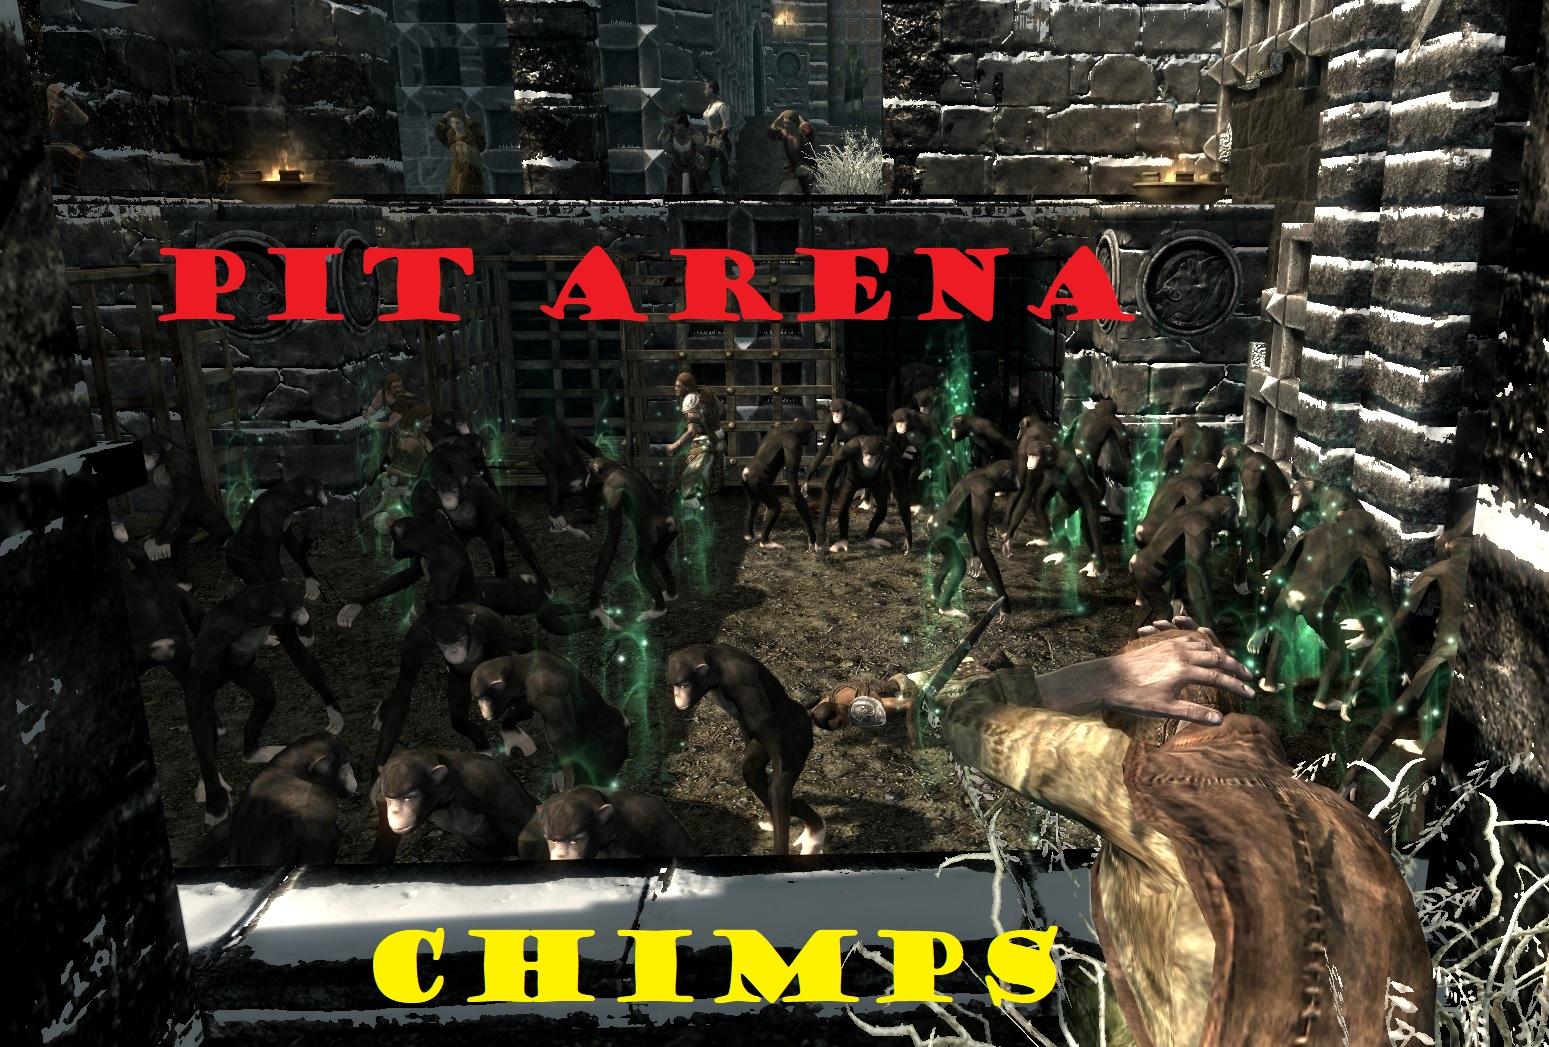 Pit Arena Chimps